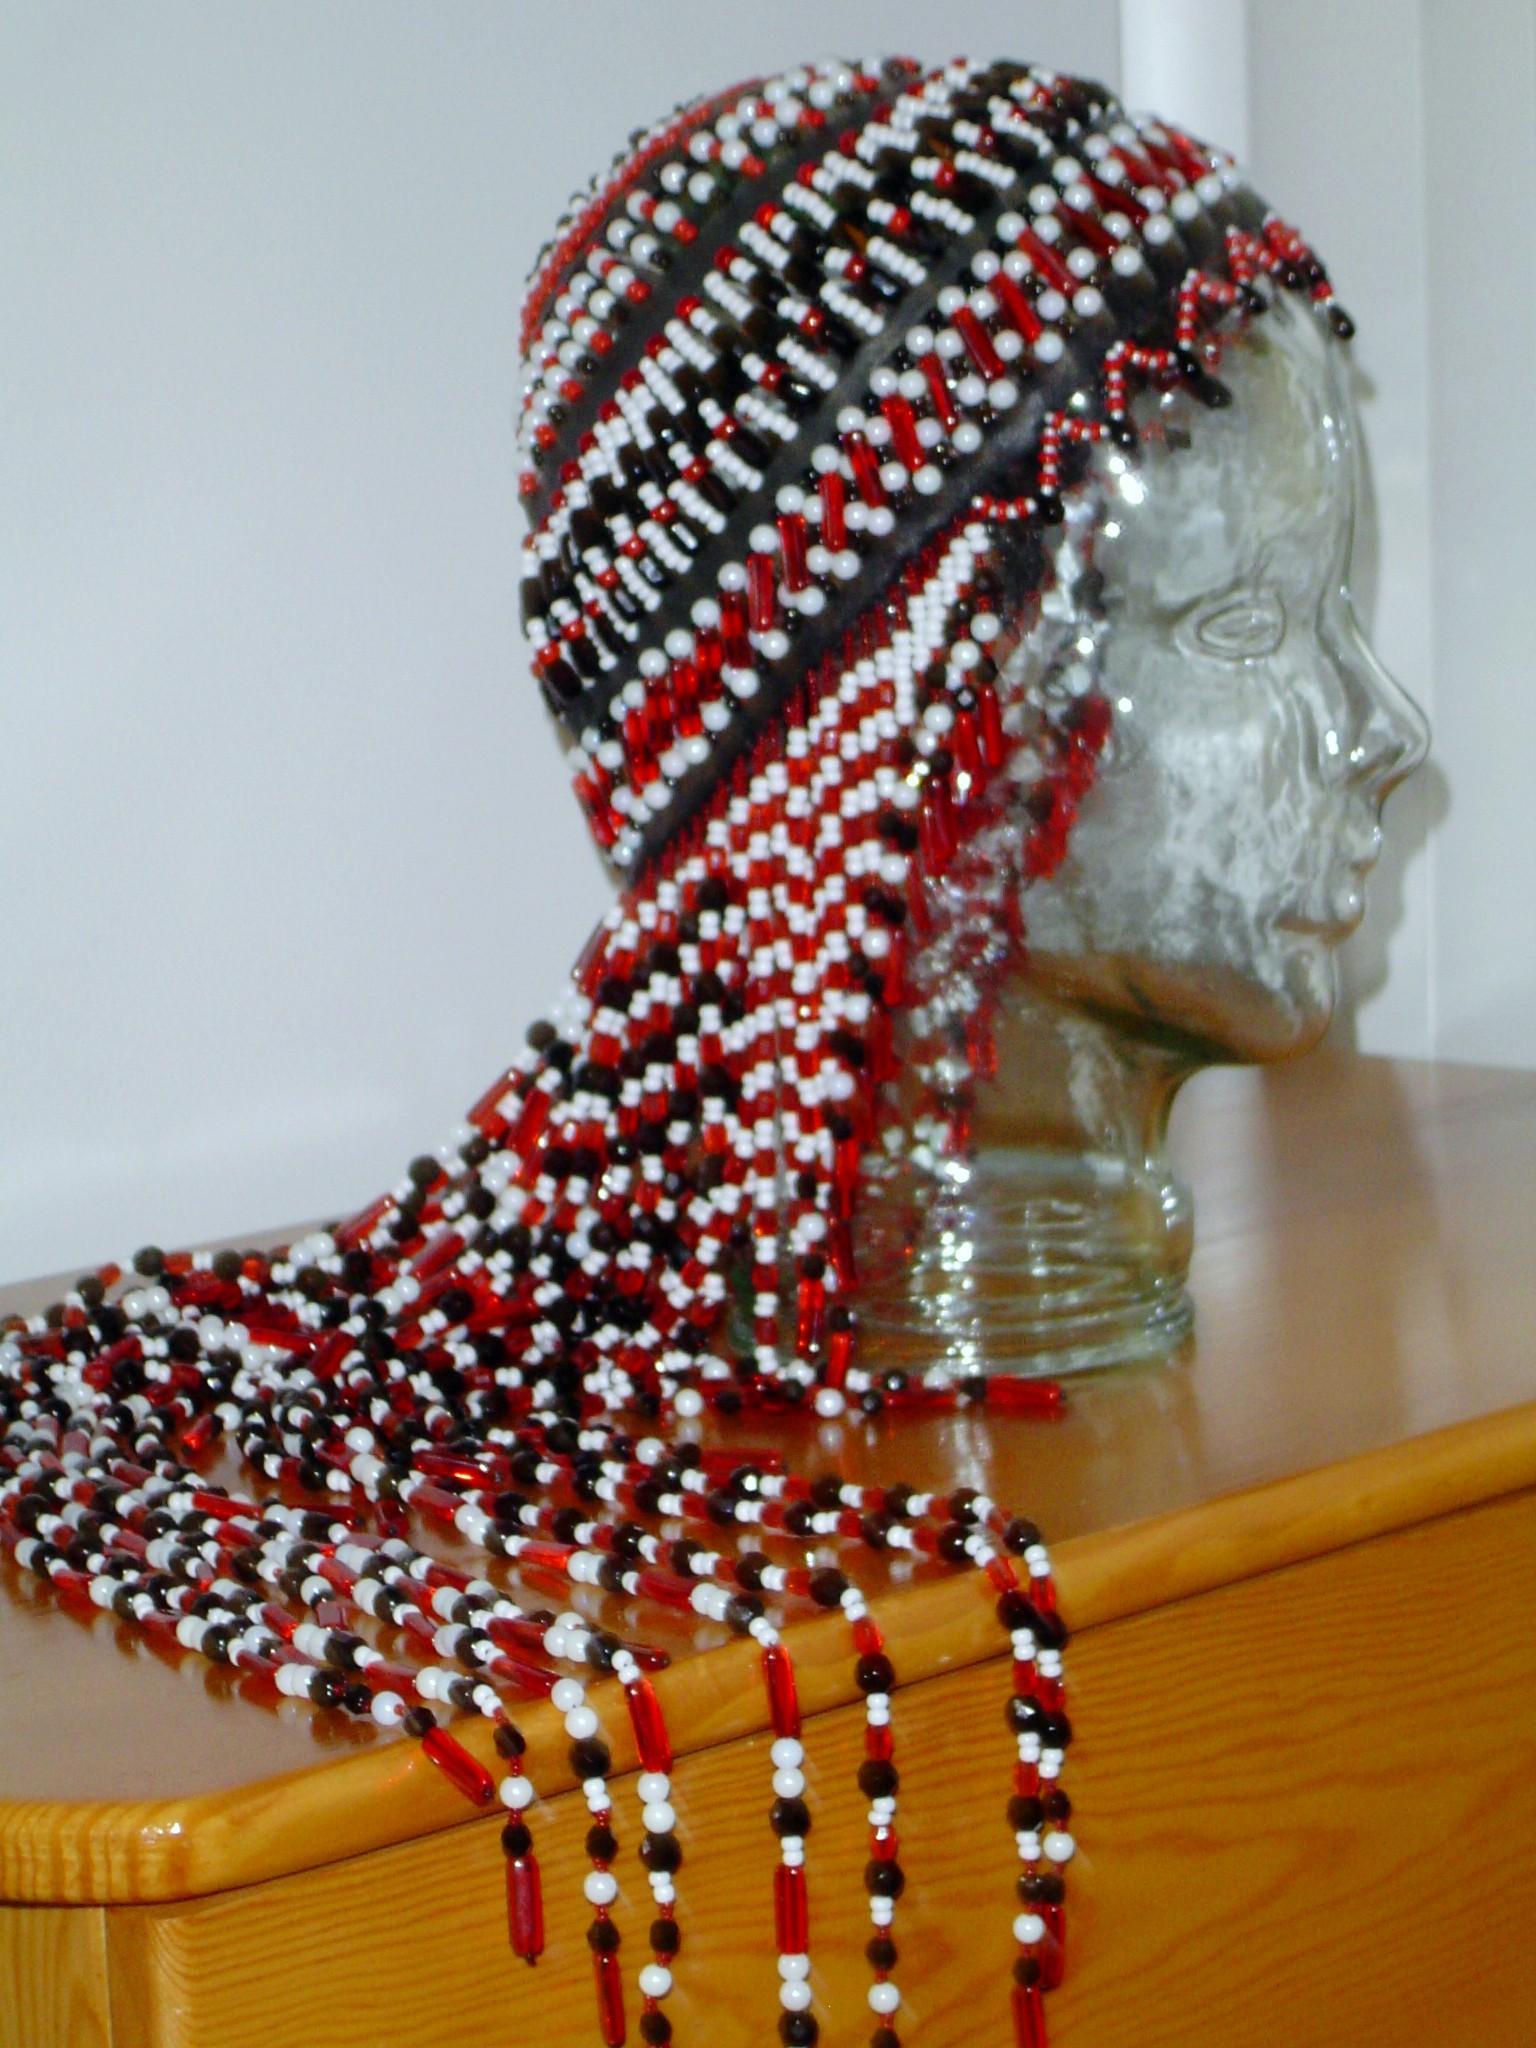 Alutiiq Woman's Dance Headdress